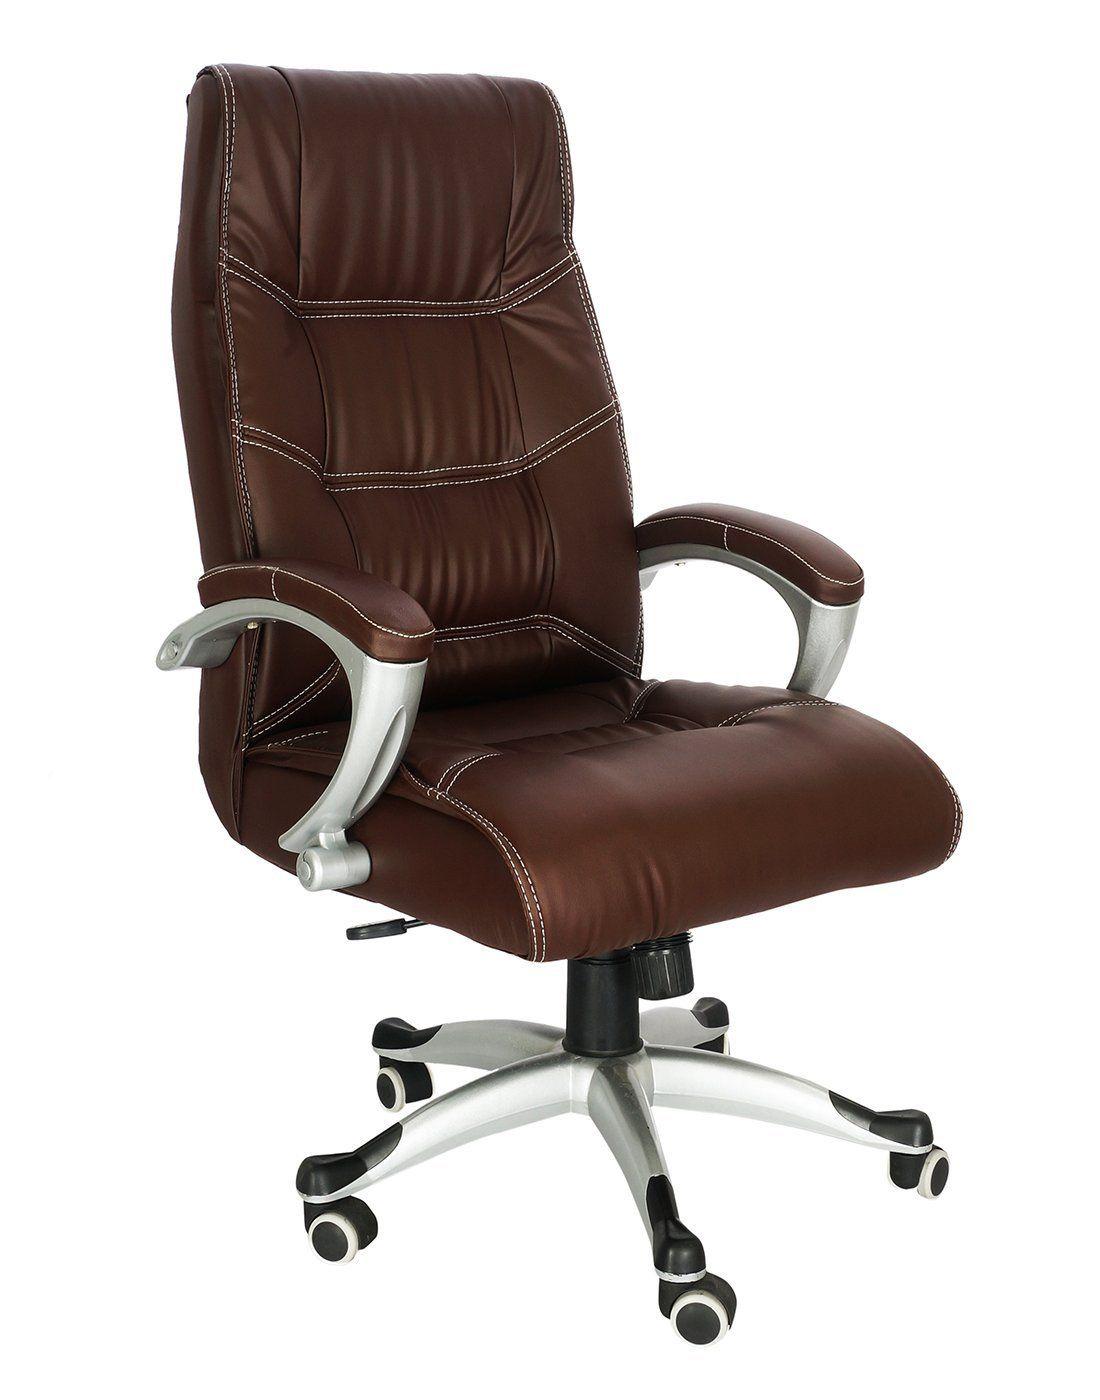 Terrific Pin By Erlangfahresi On Desk Office Design High Back Inzonedesignstudio Interior Chair Design Inzonedesignstudiocom